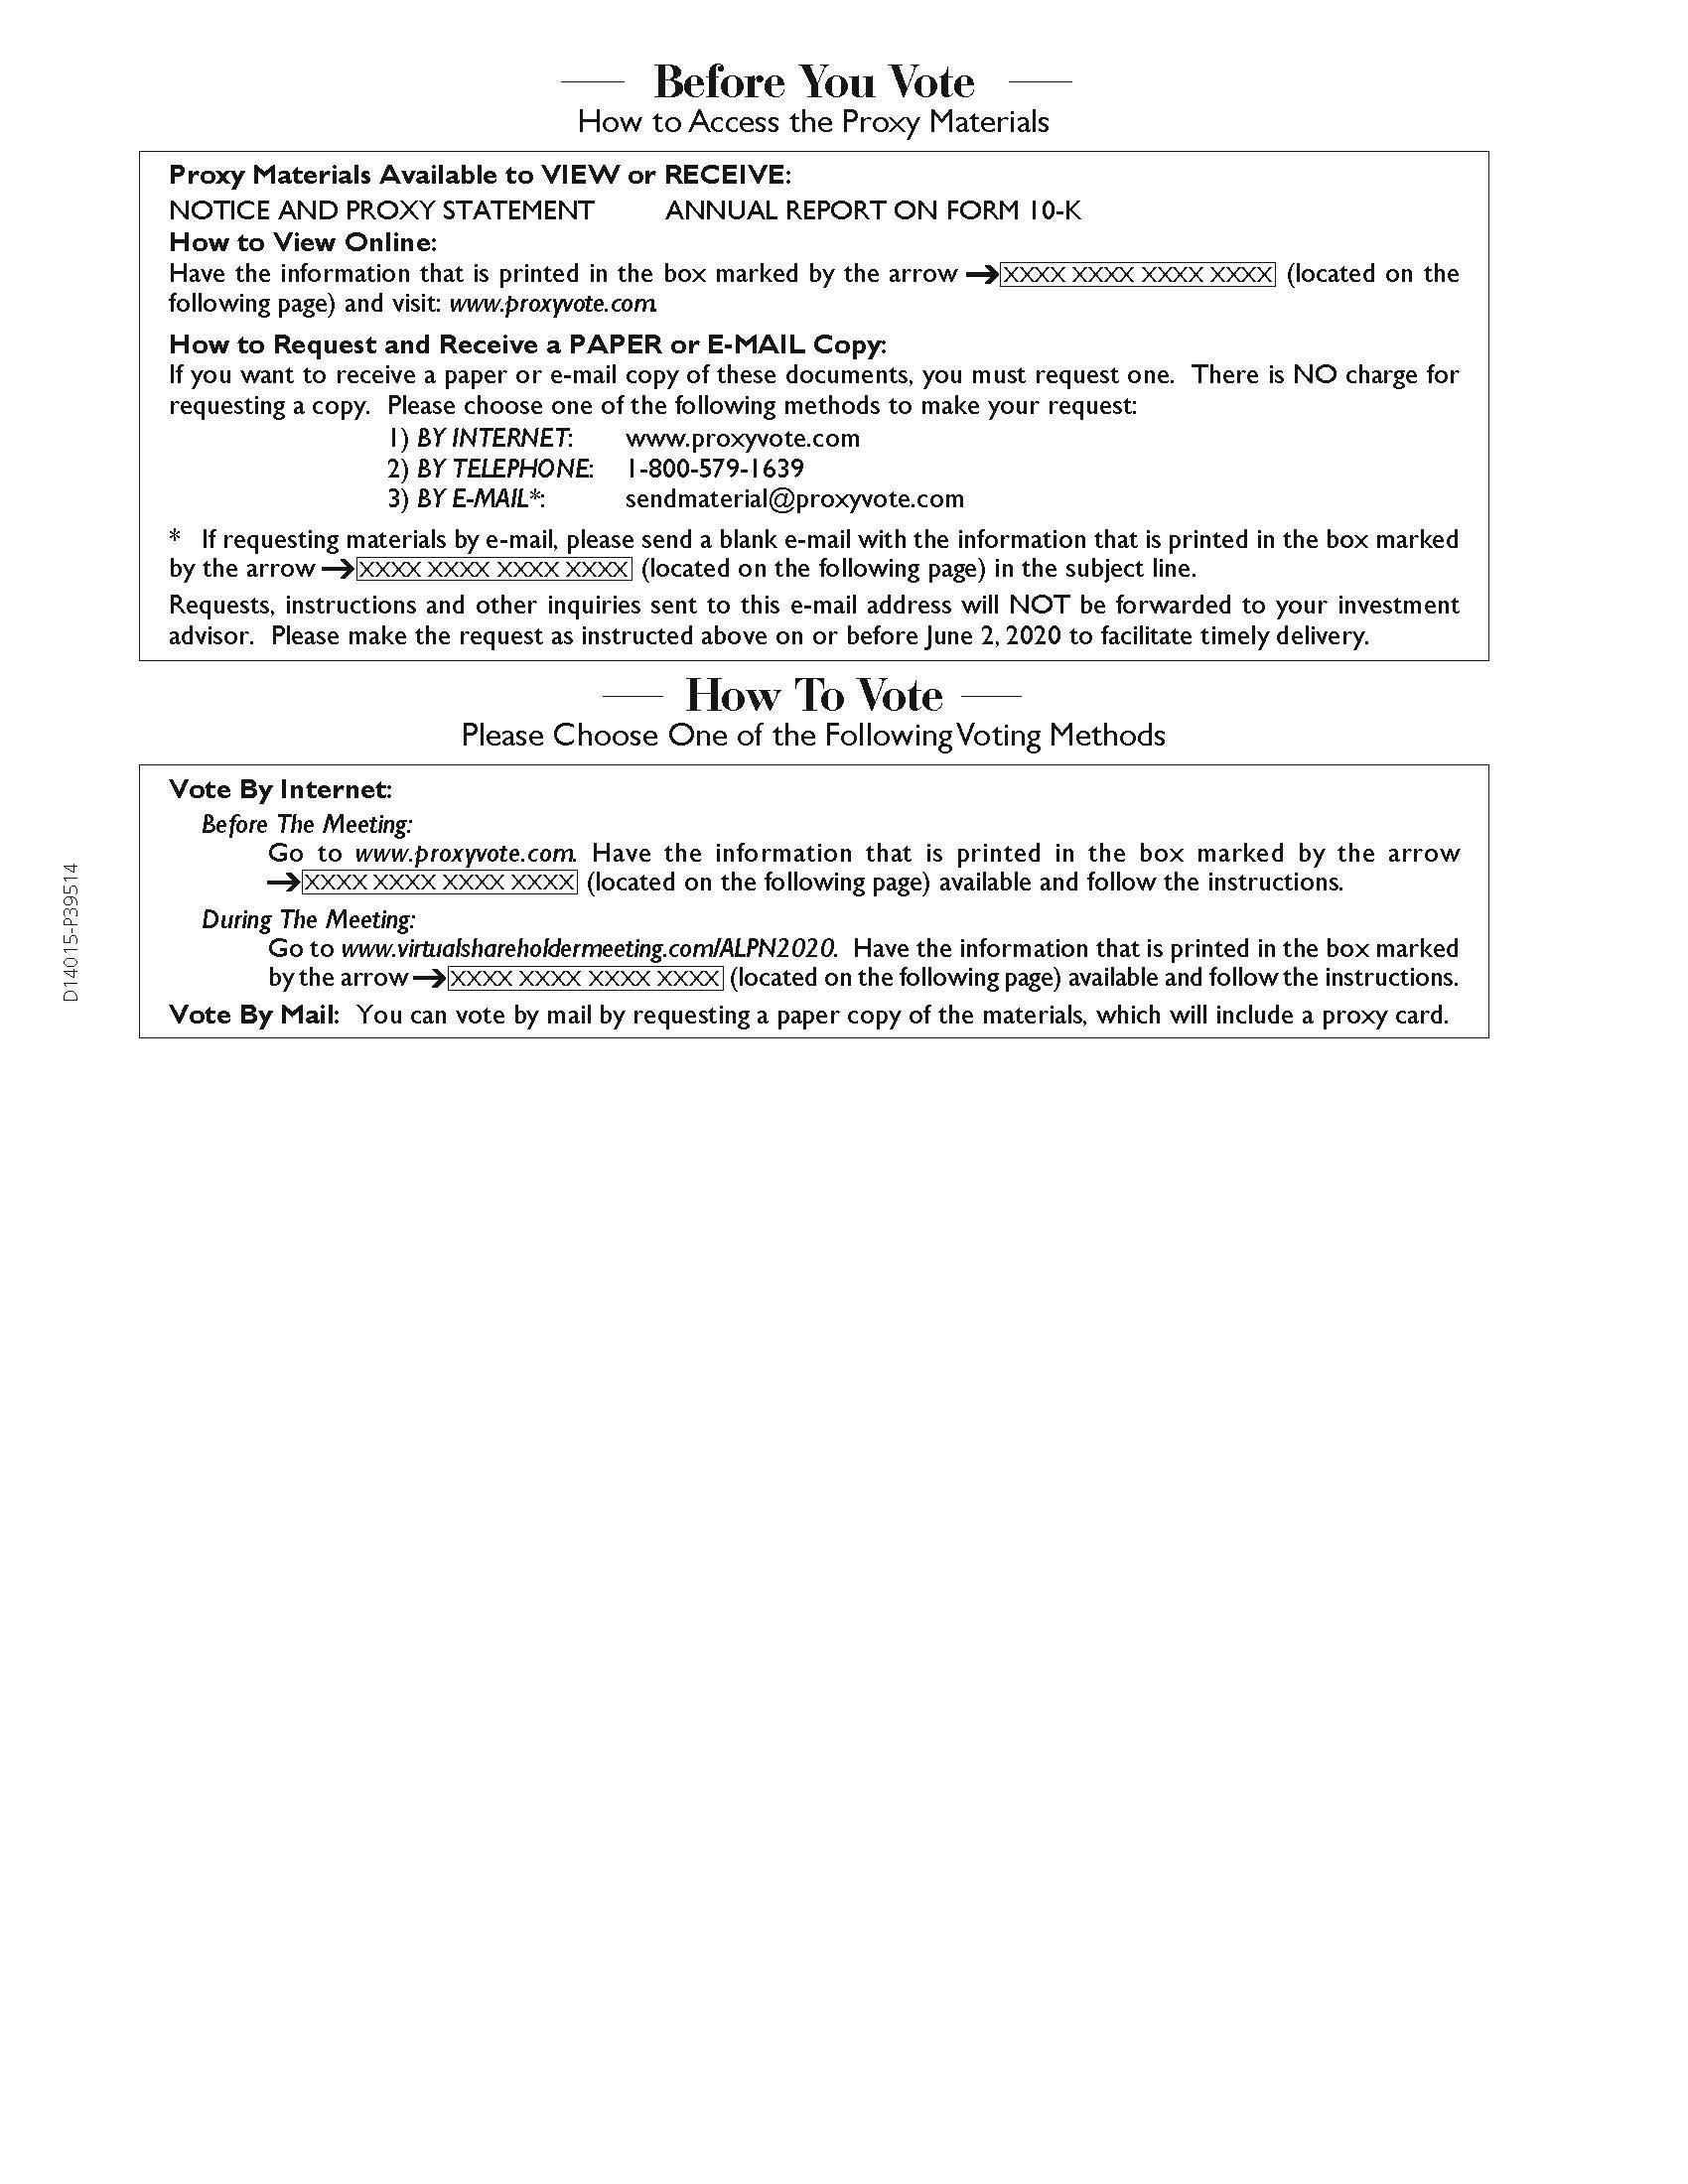 https://cdn.kscope.io/3e54d85ccbc8bc0998547f5af718375c-alpineimmunesciencesinc_na02.jpg